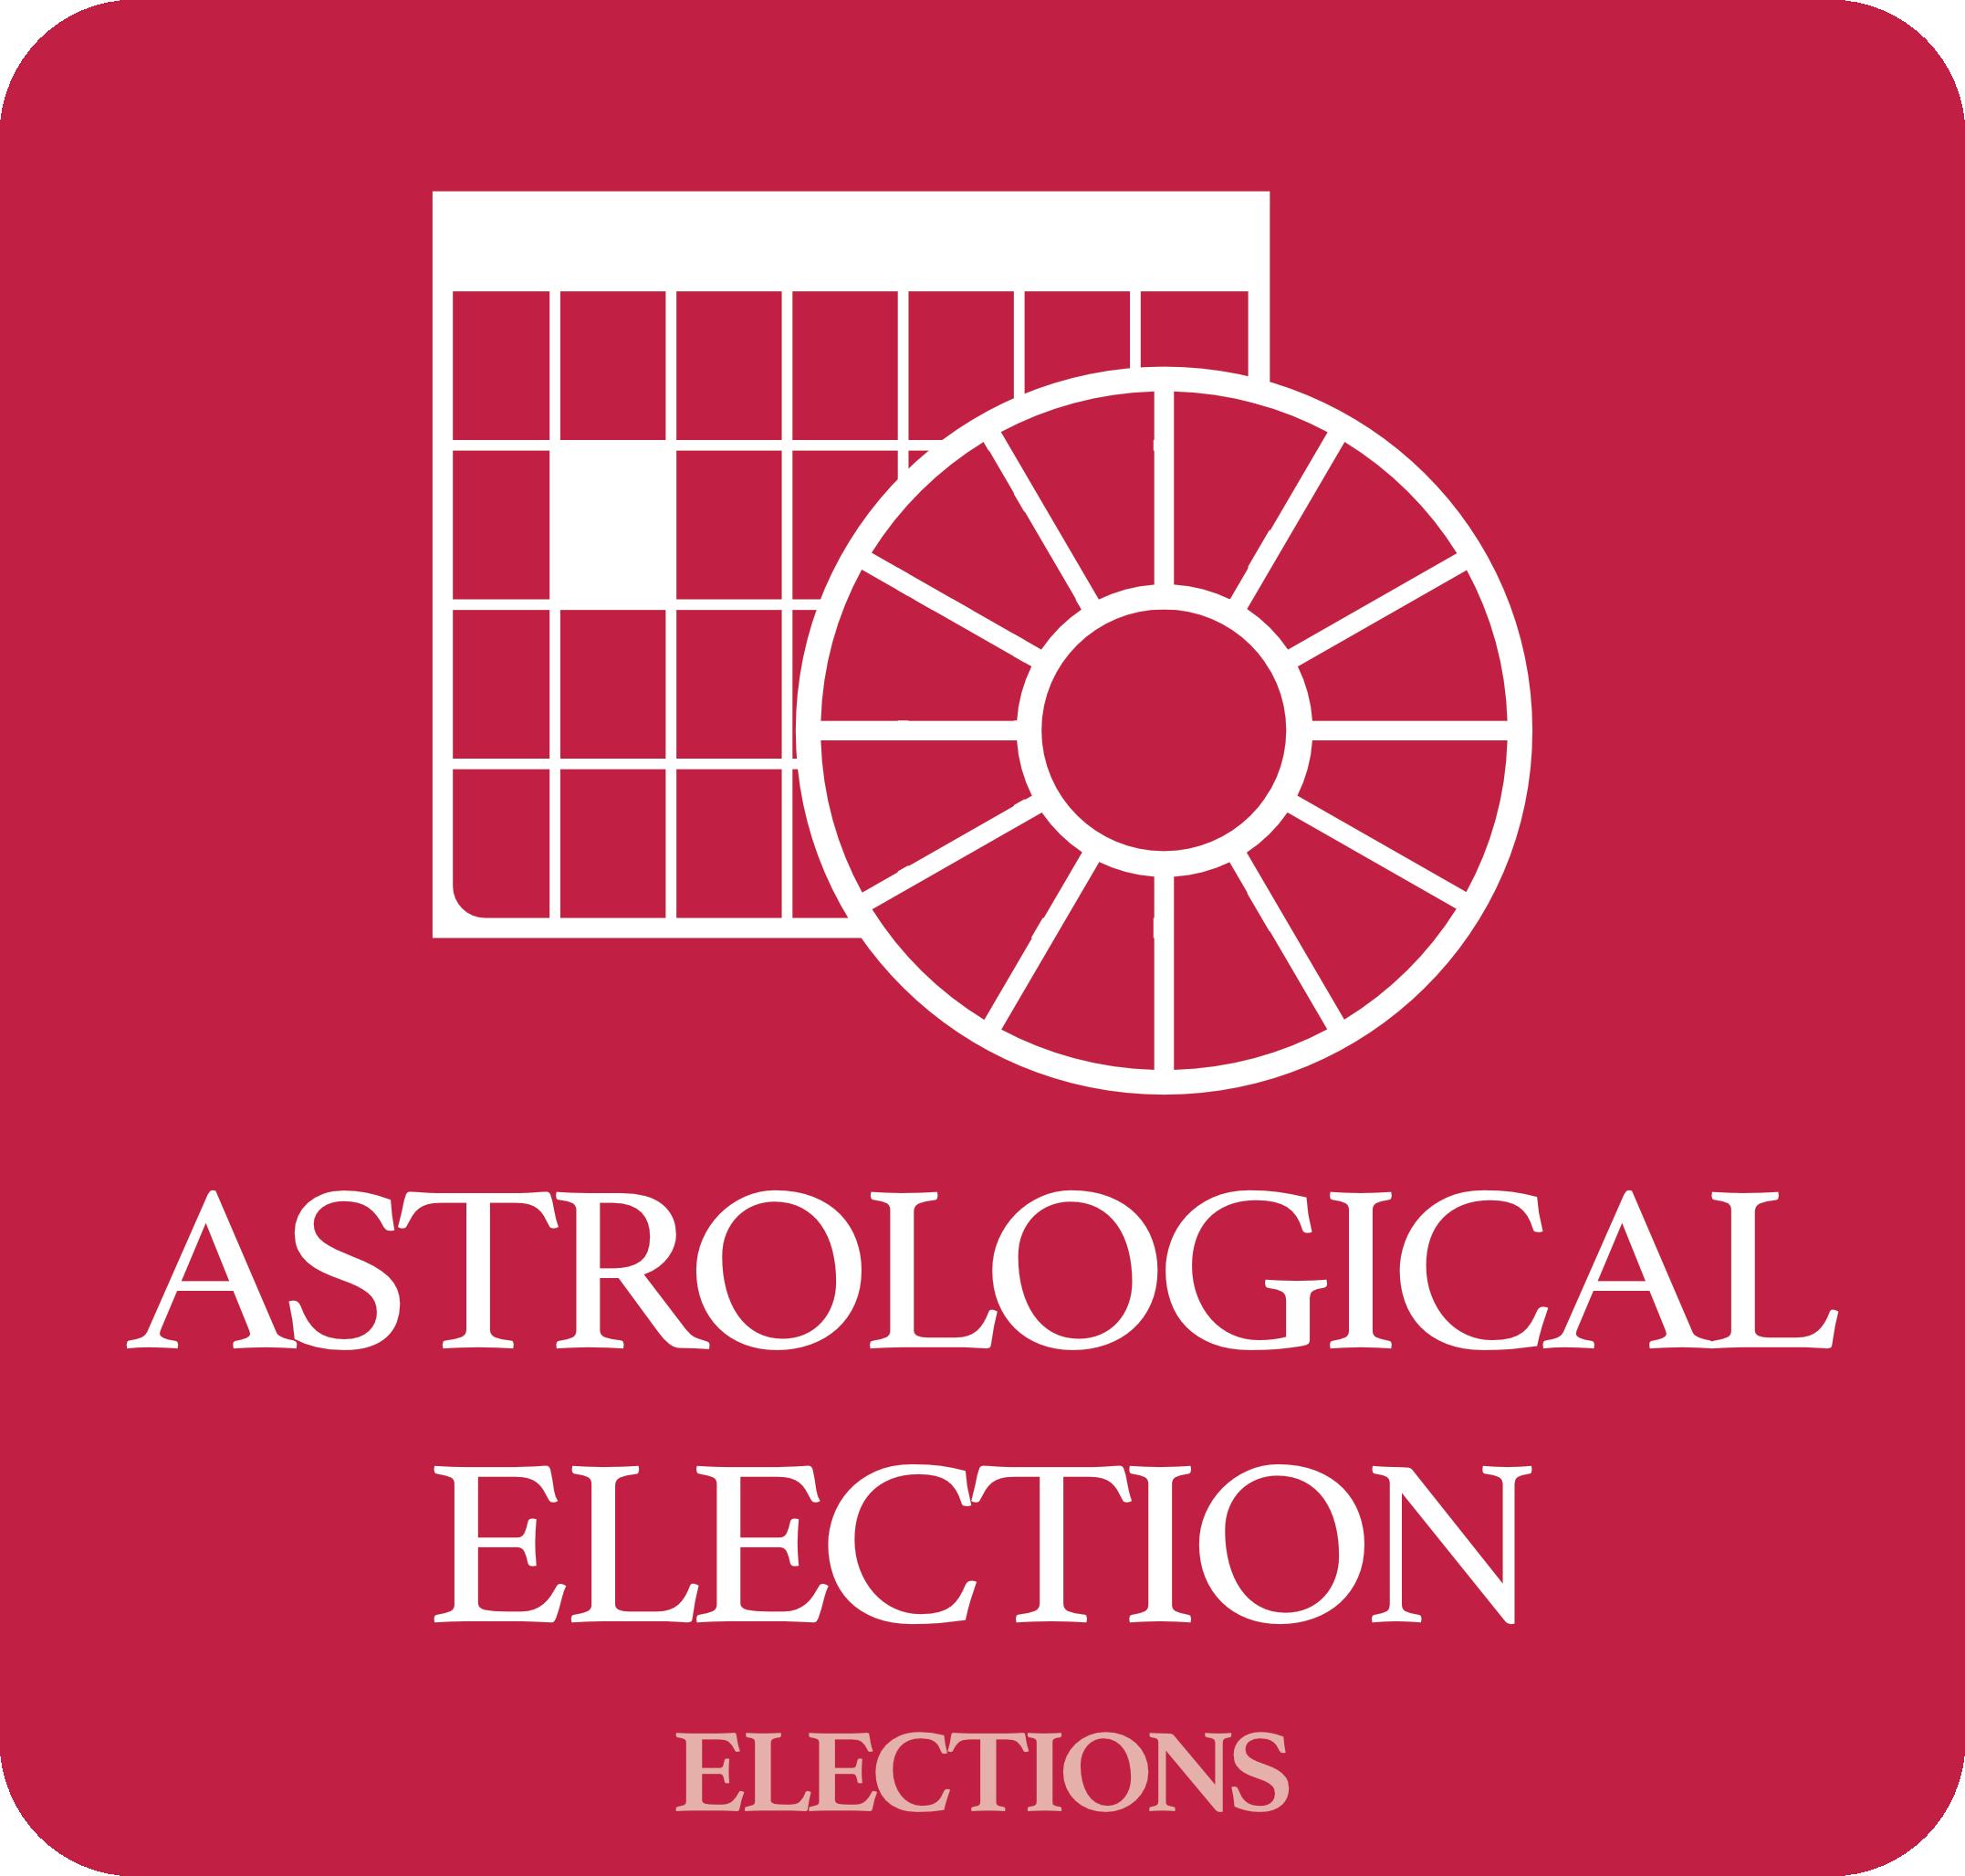 Astrological Election